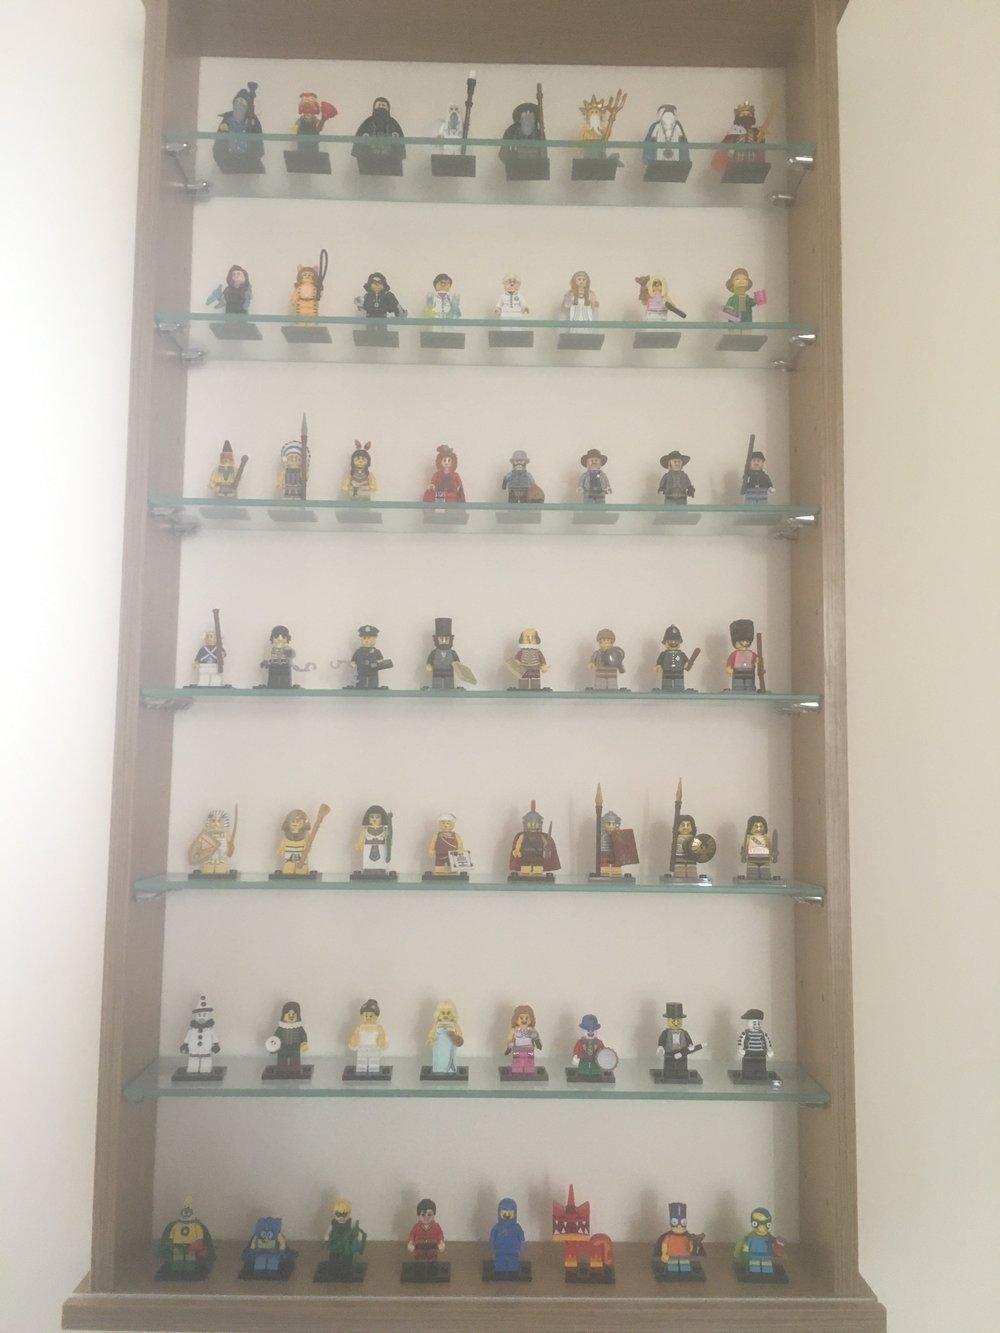 My Lego display